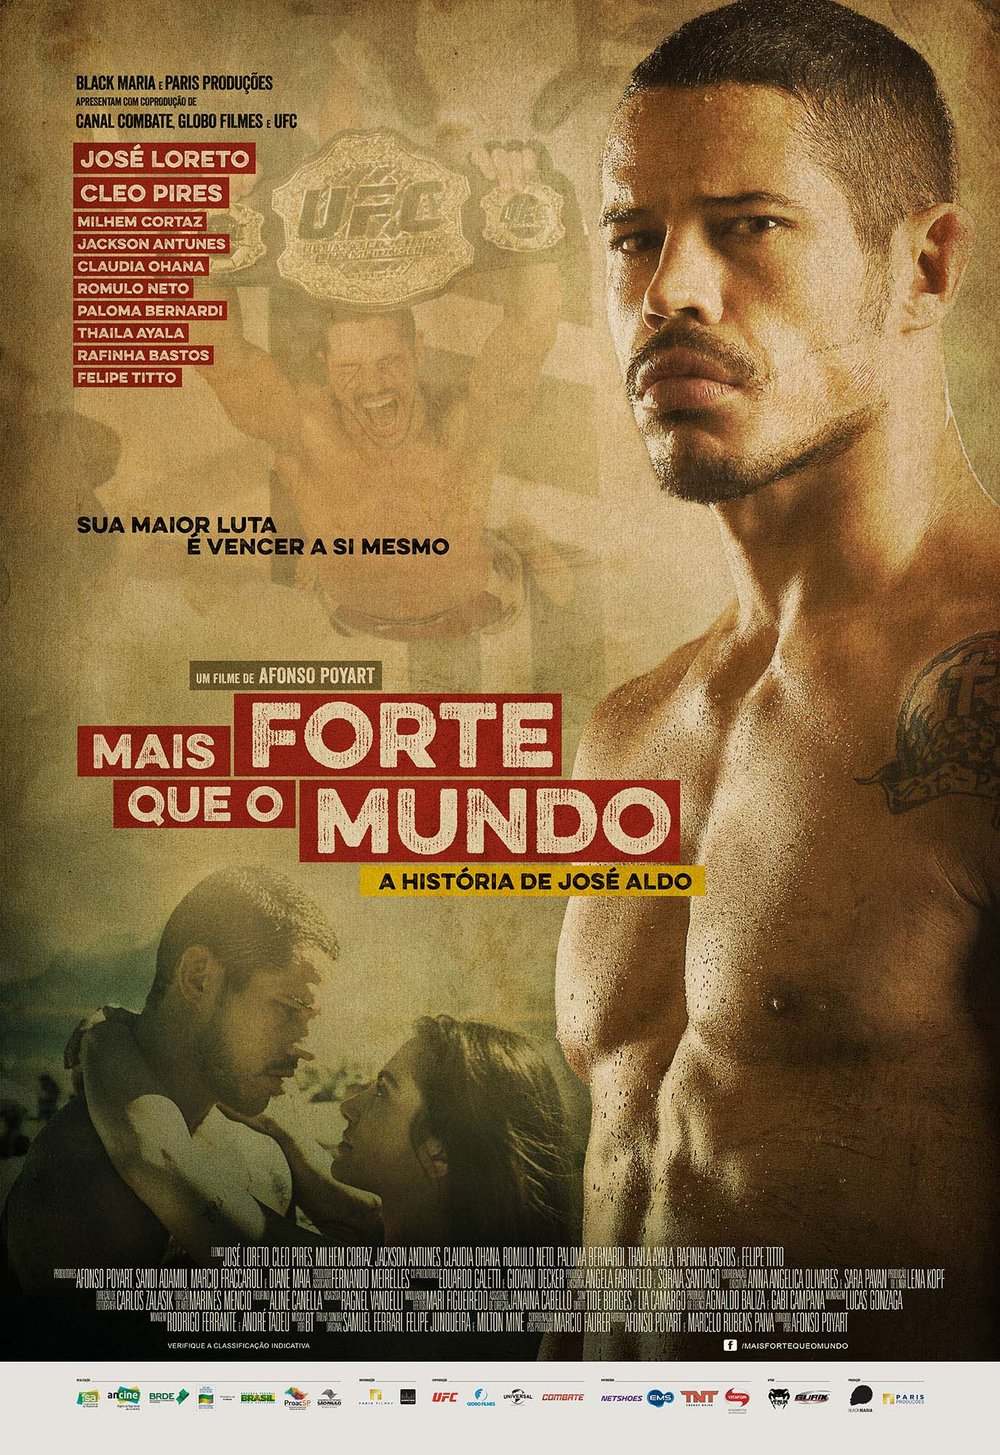 11_MaisFortequeOMundo_Cartaz.jpg